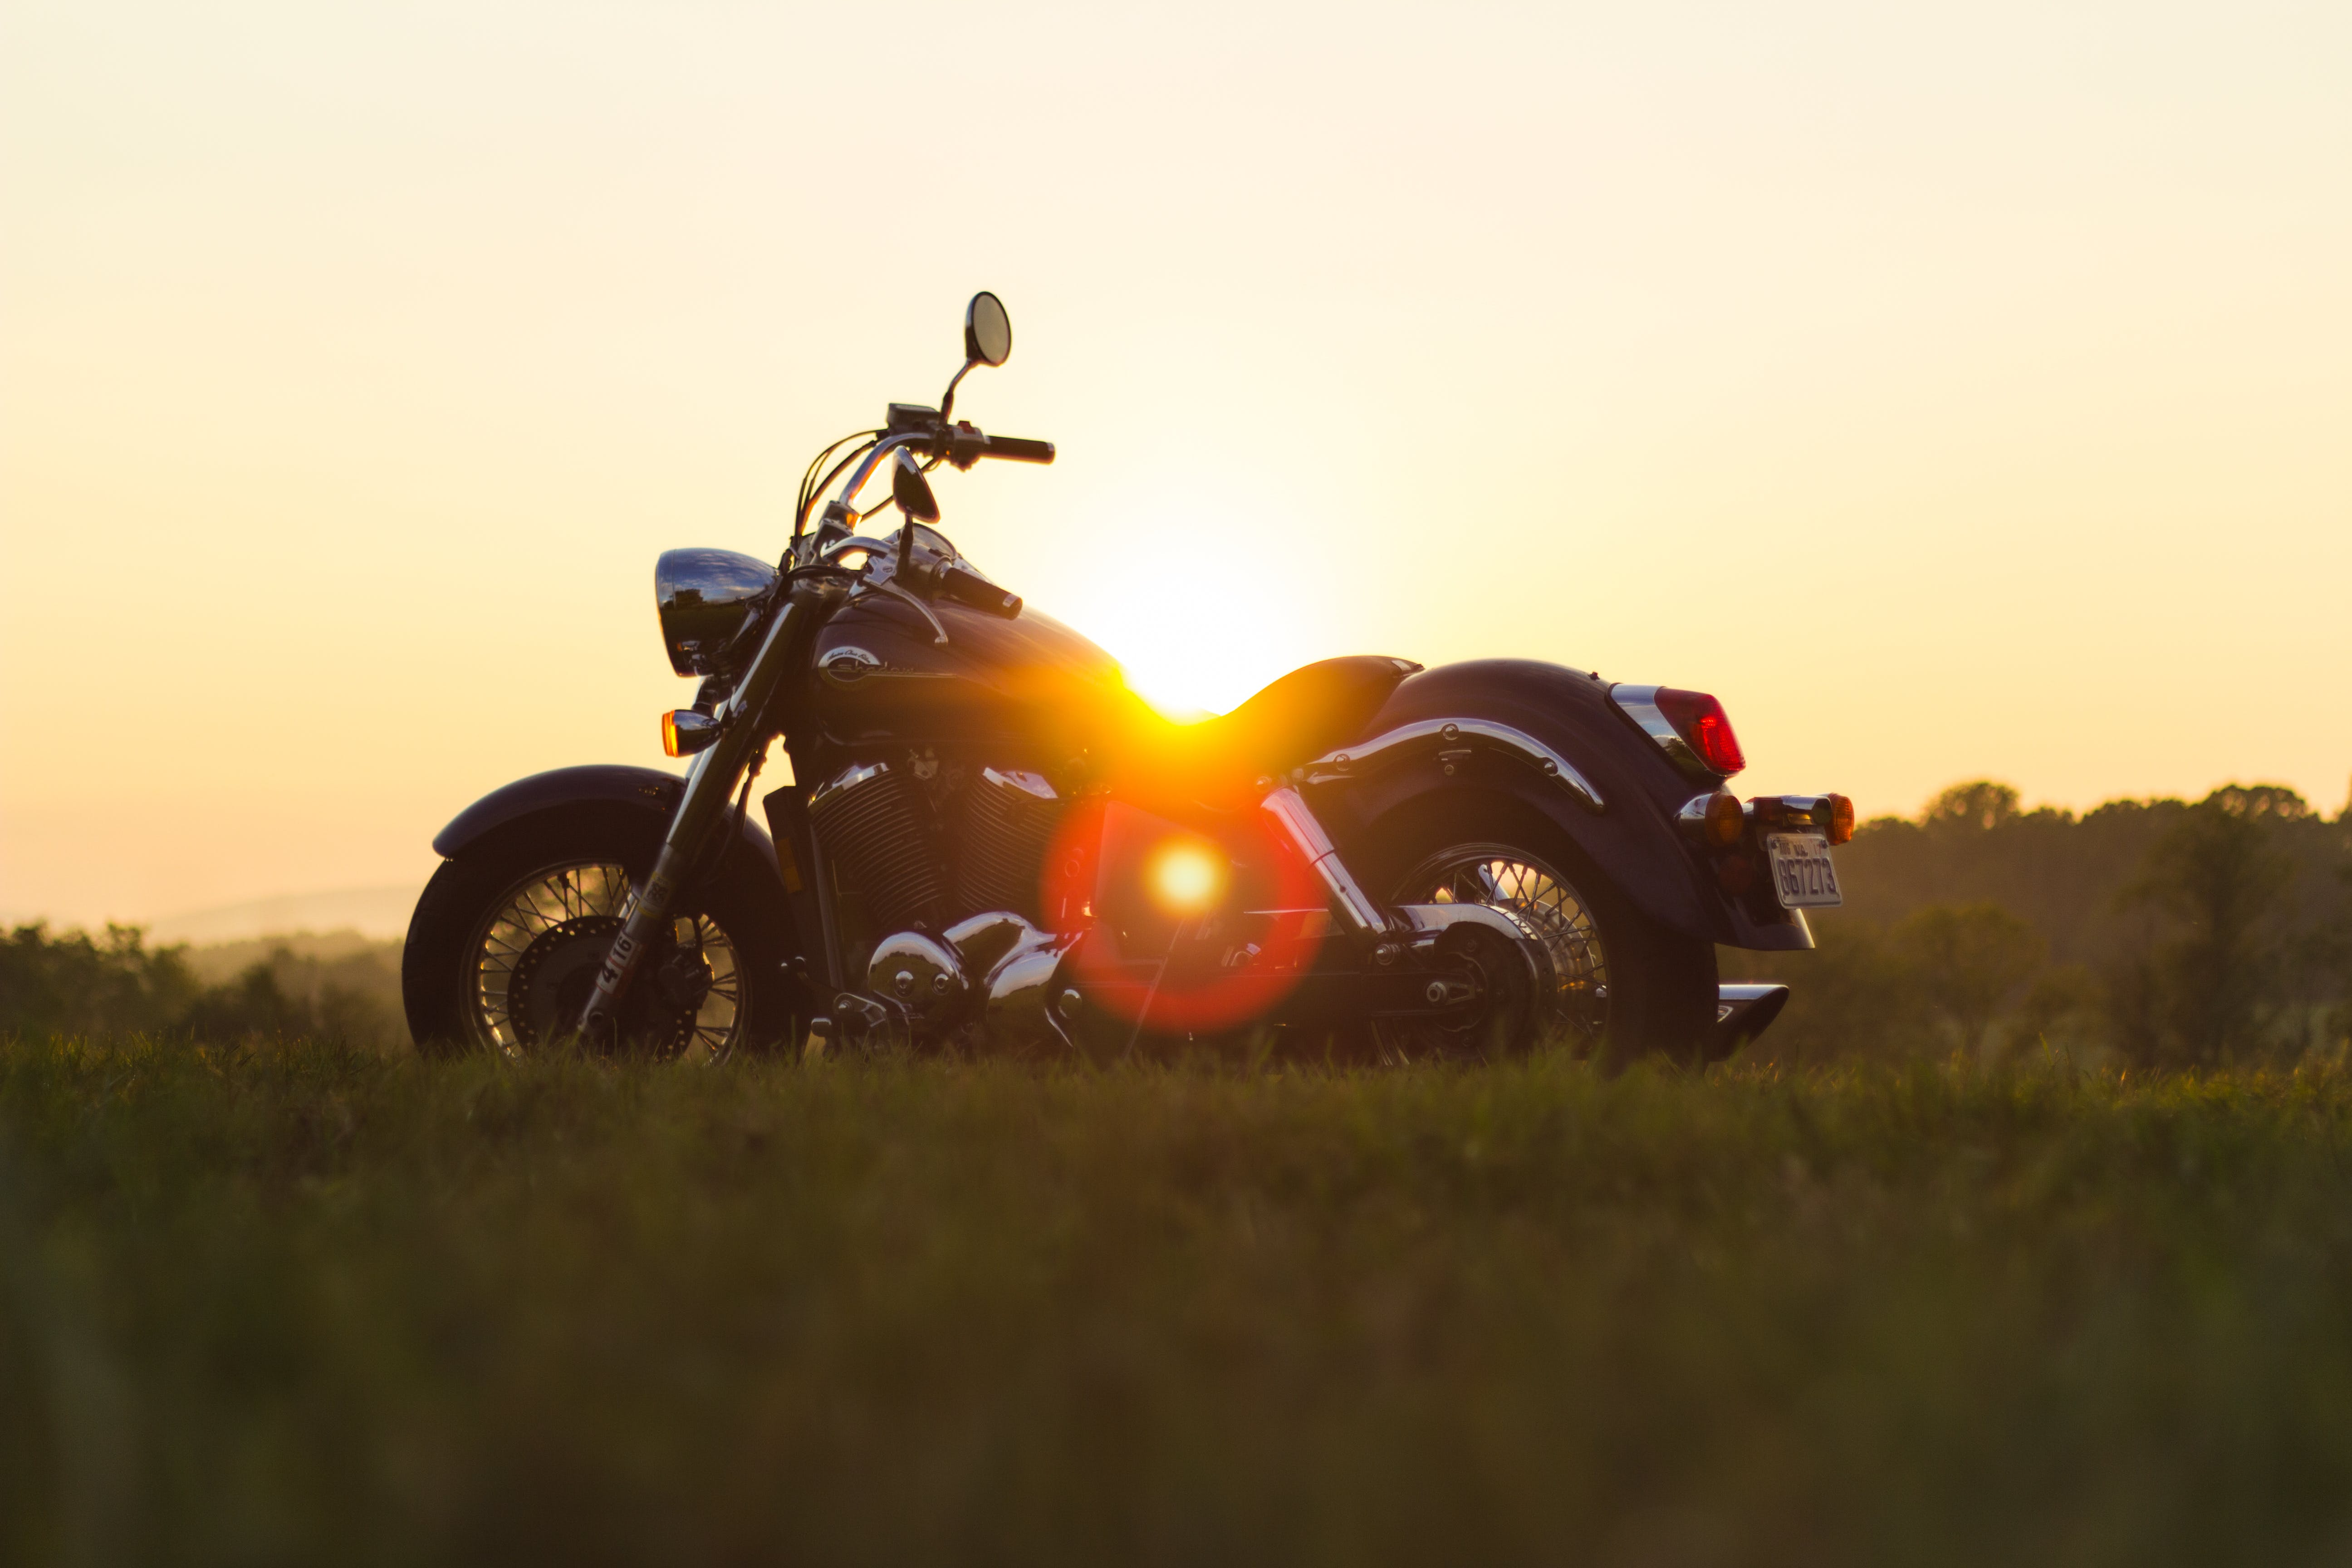 motorbike, motorcycle, roadtrip